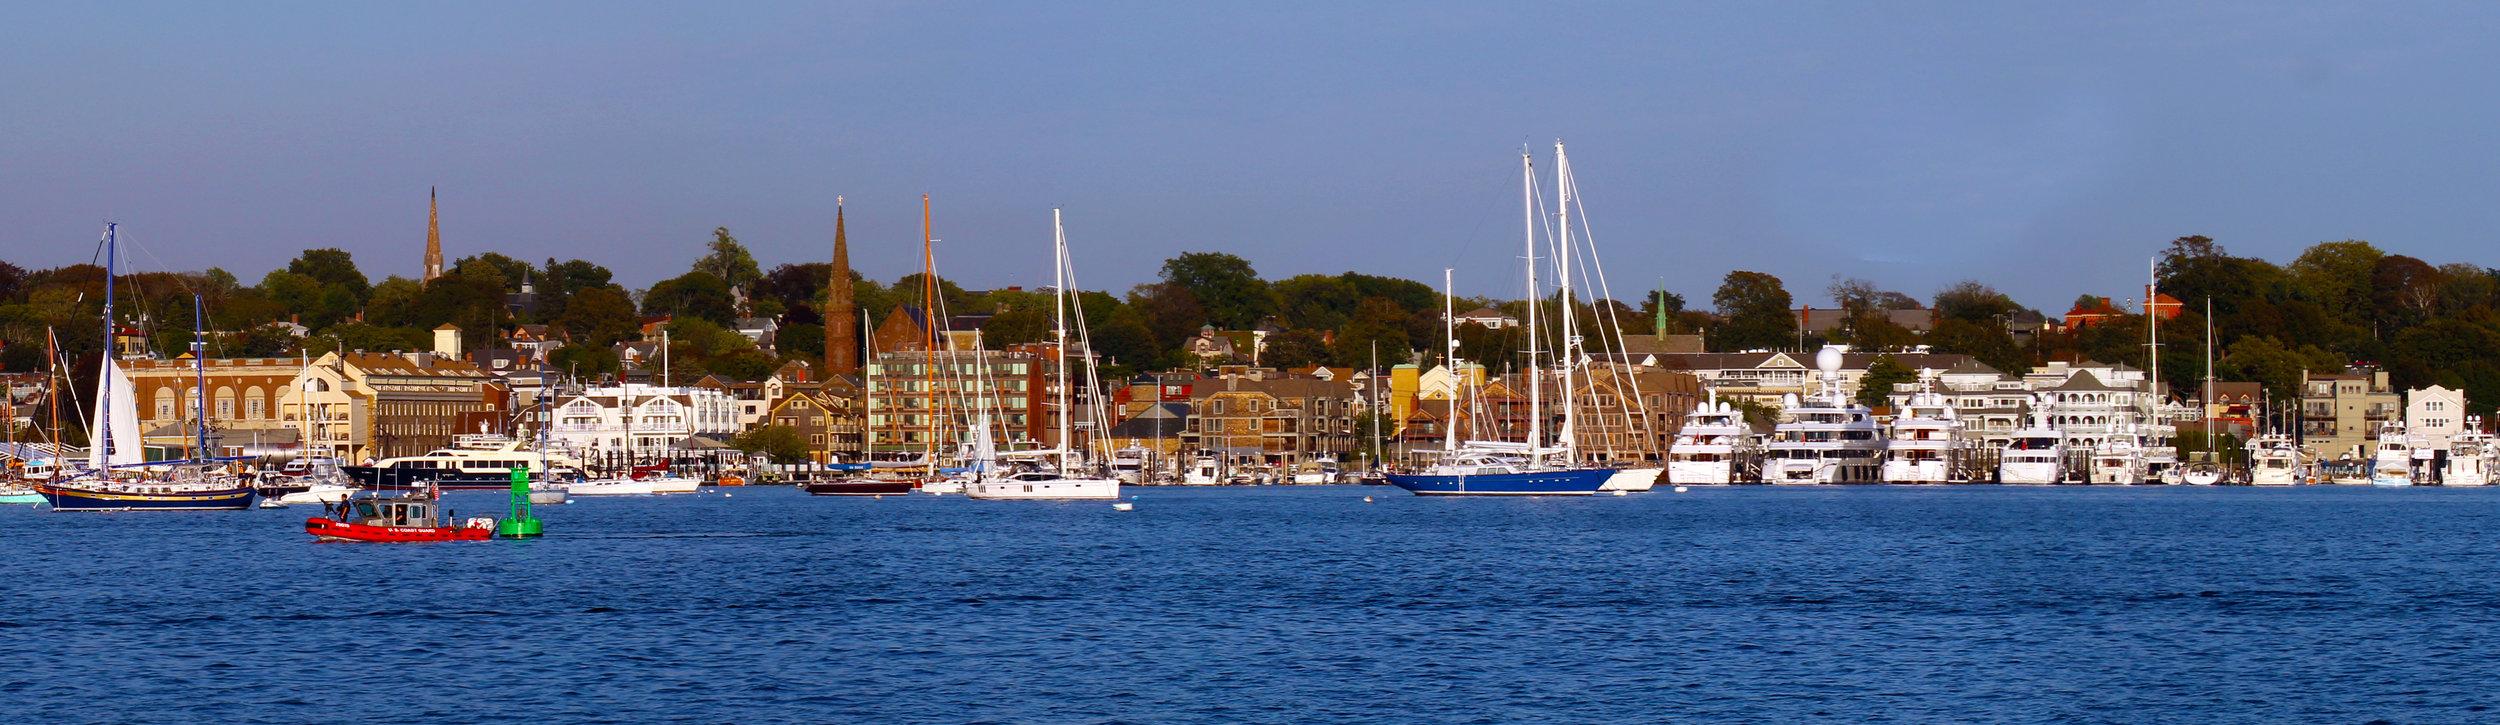 Newport Rhode Island   © Joanne DiBona